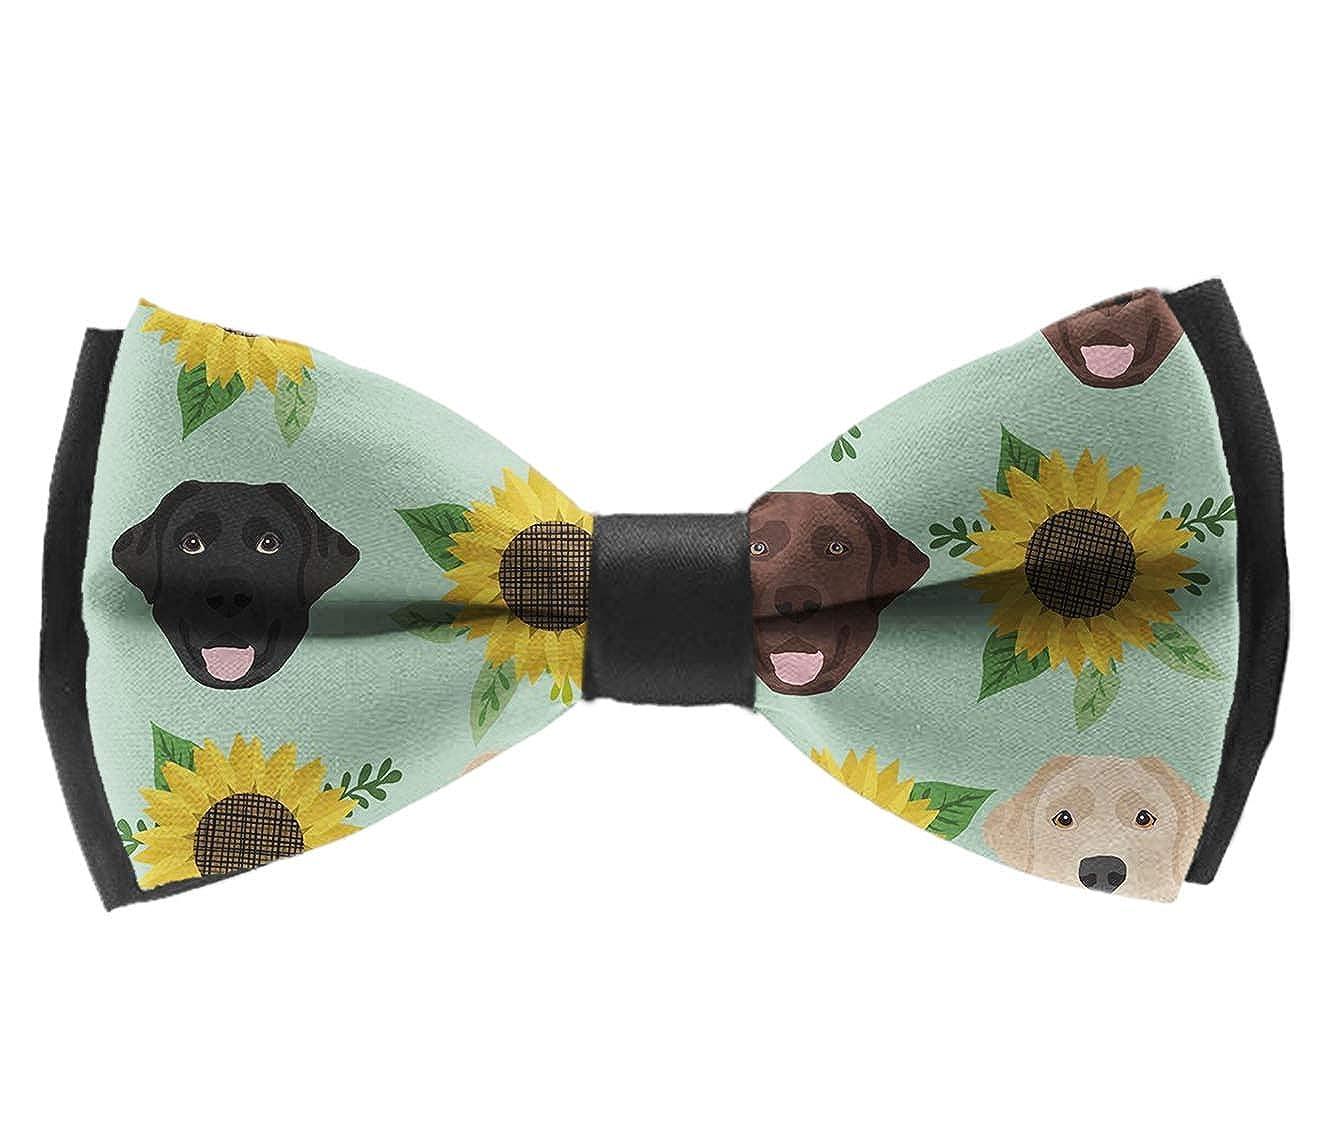 Labrador Floral Sunflower Bow Tie for Men Tuxedo /& Wedding Solid Color